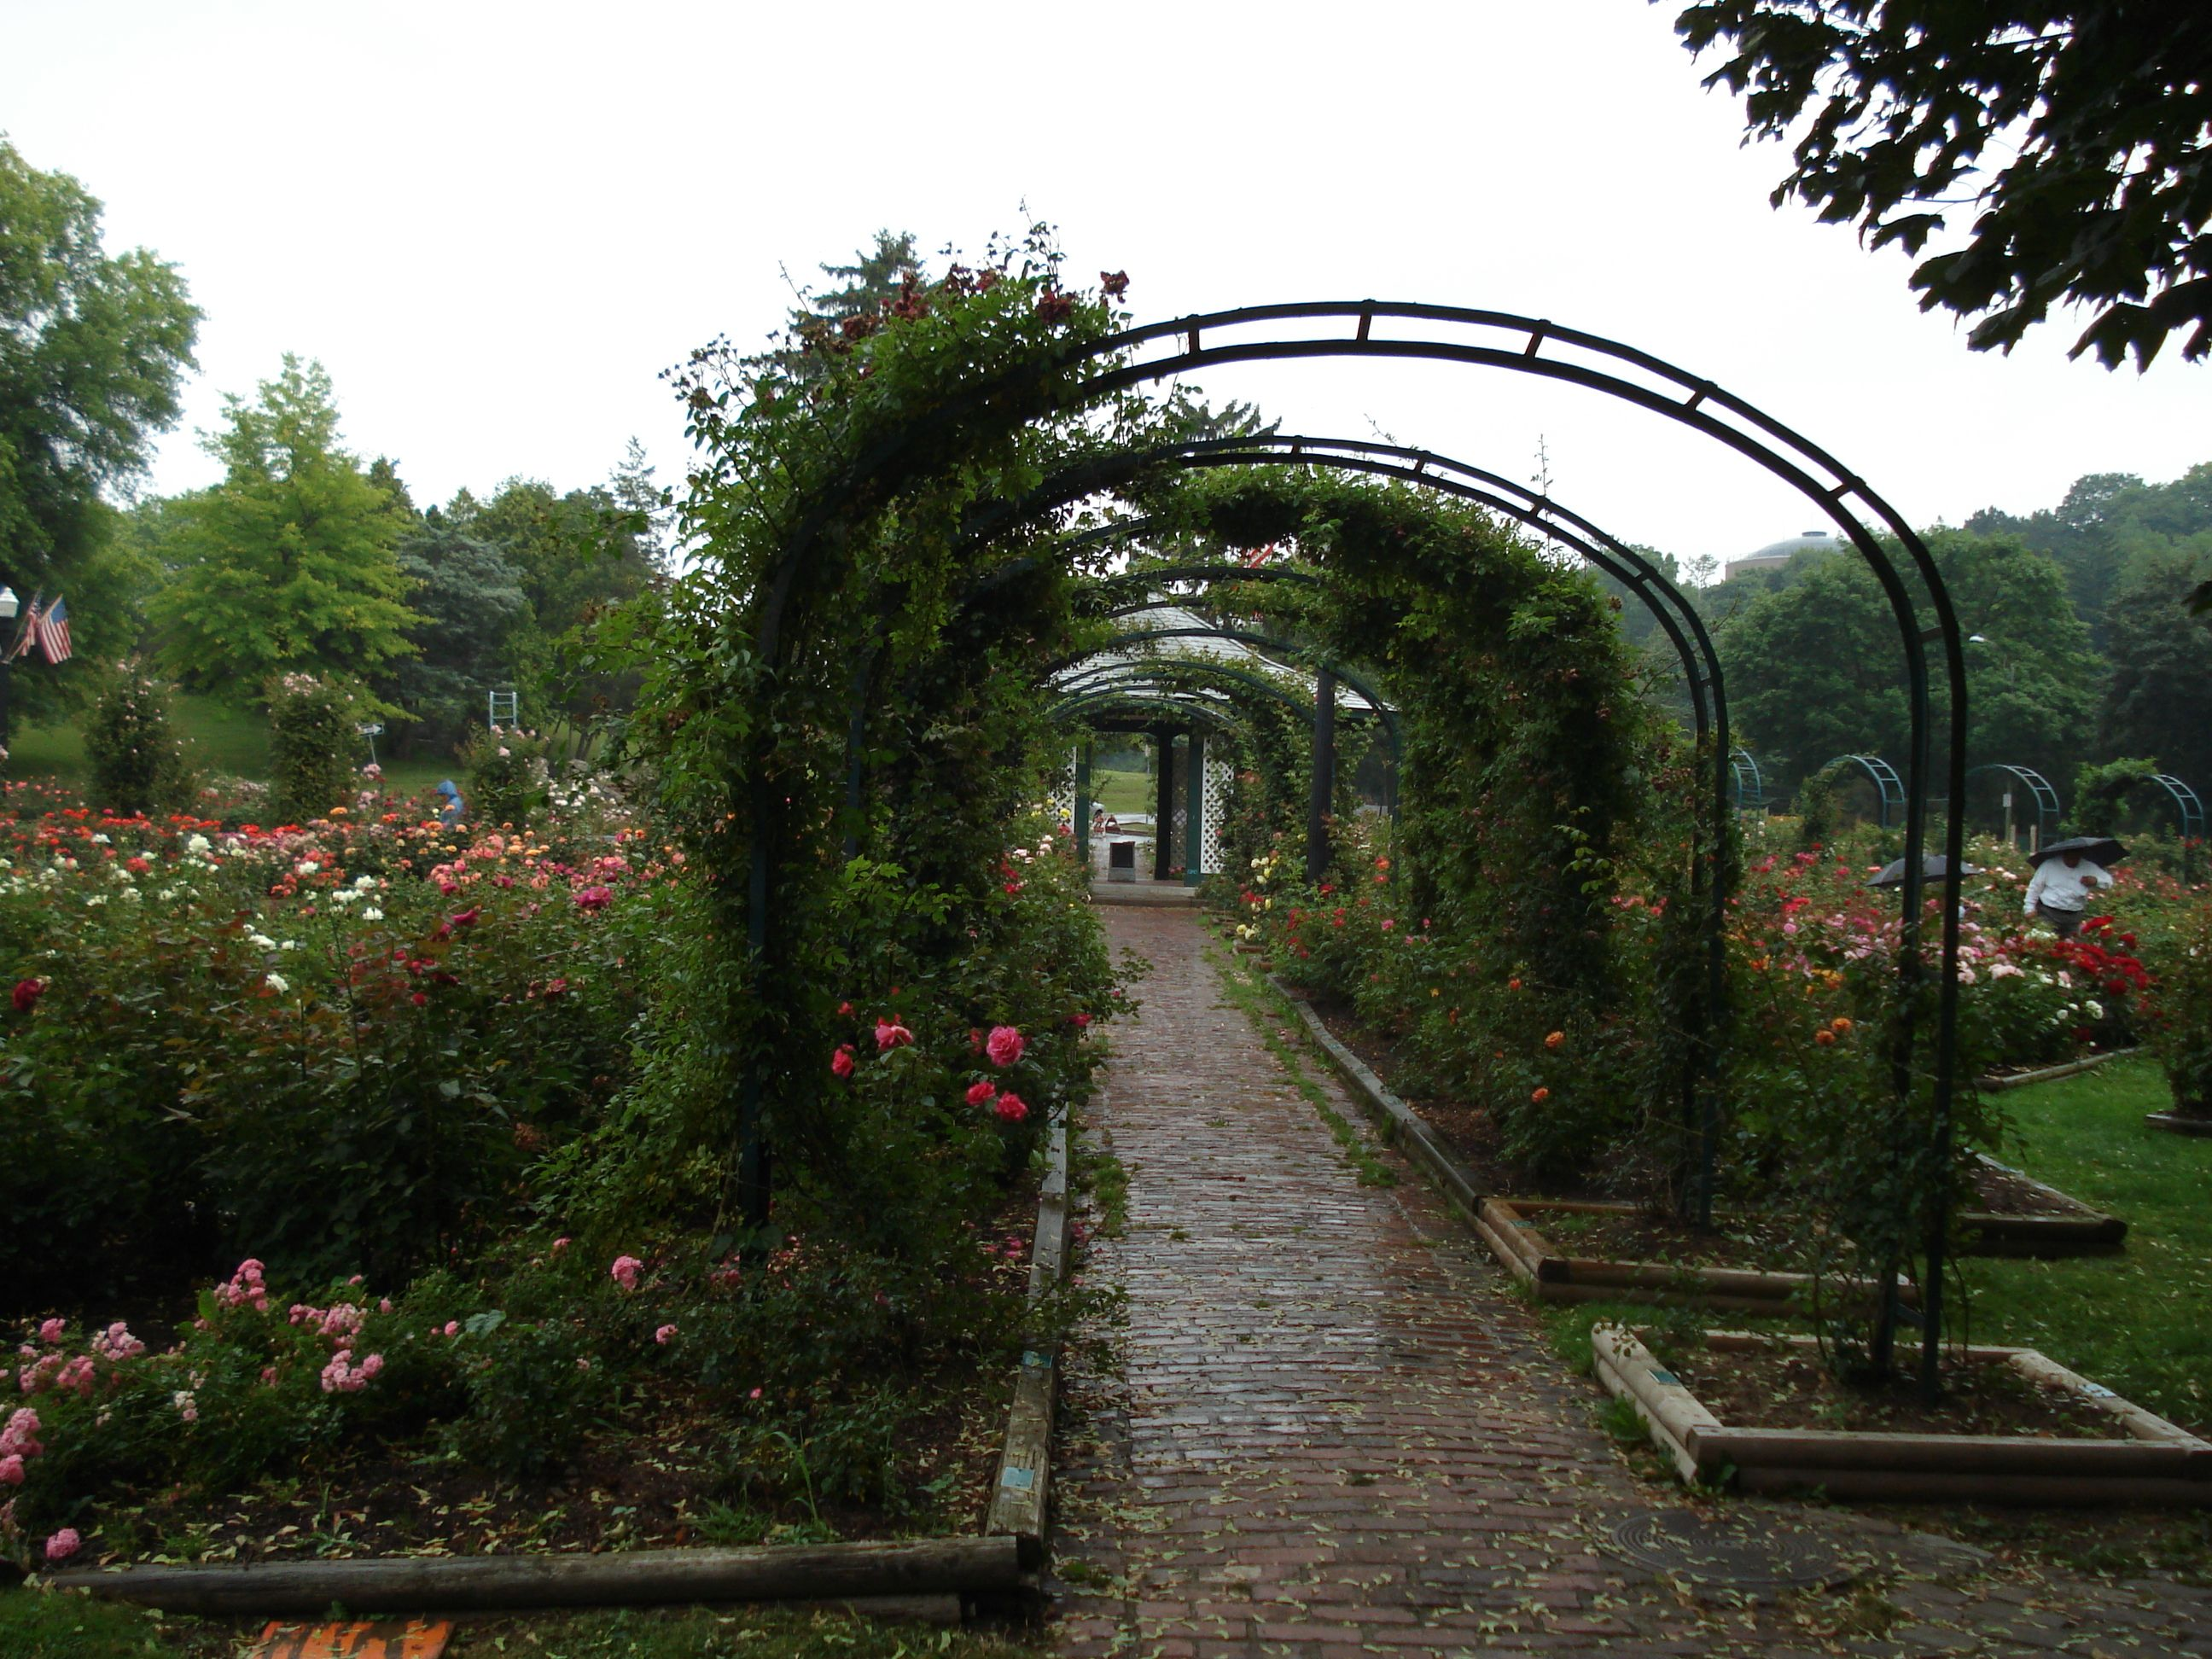 Dr. E.M. Mills Rose Garden is located in Thornden Park